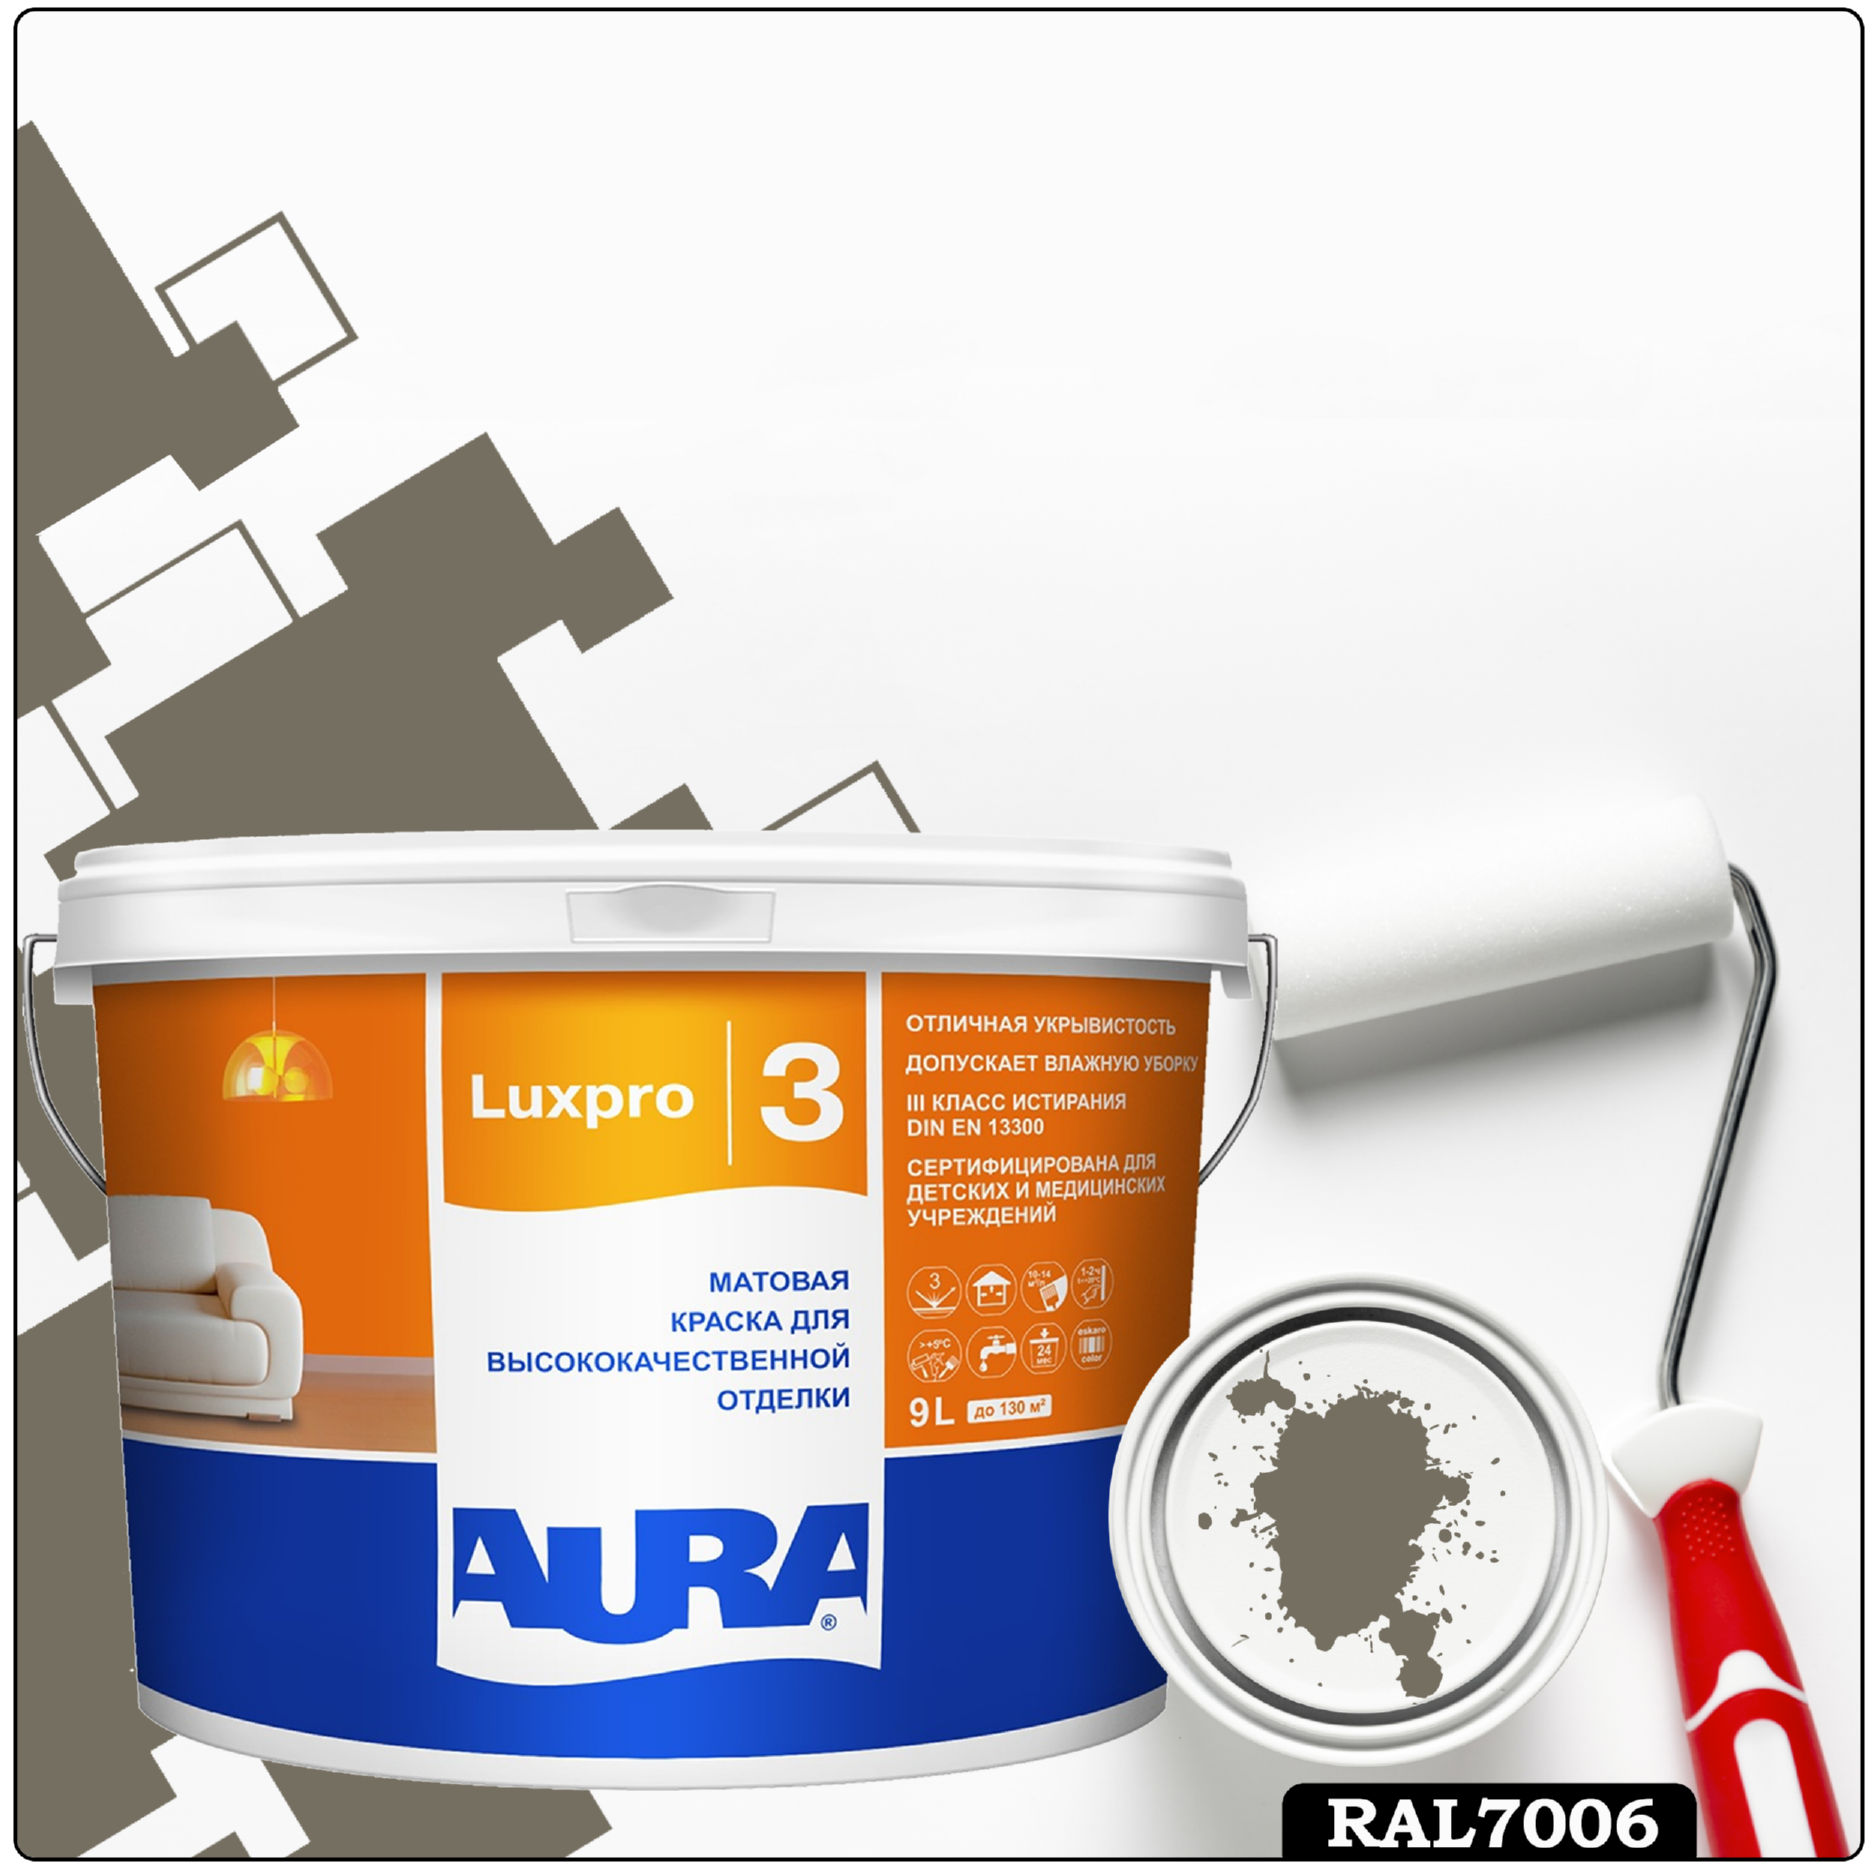 Фото 7 - Краска Aura LuxPRO 3, RAL 7006 Бежево-серый, латексная, шелково-матовая, интерьерная, 9л, Аура.